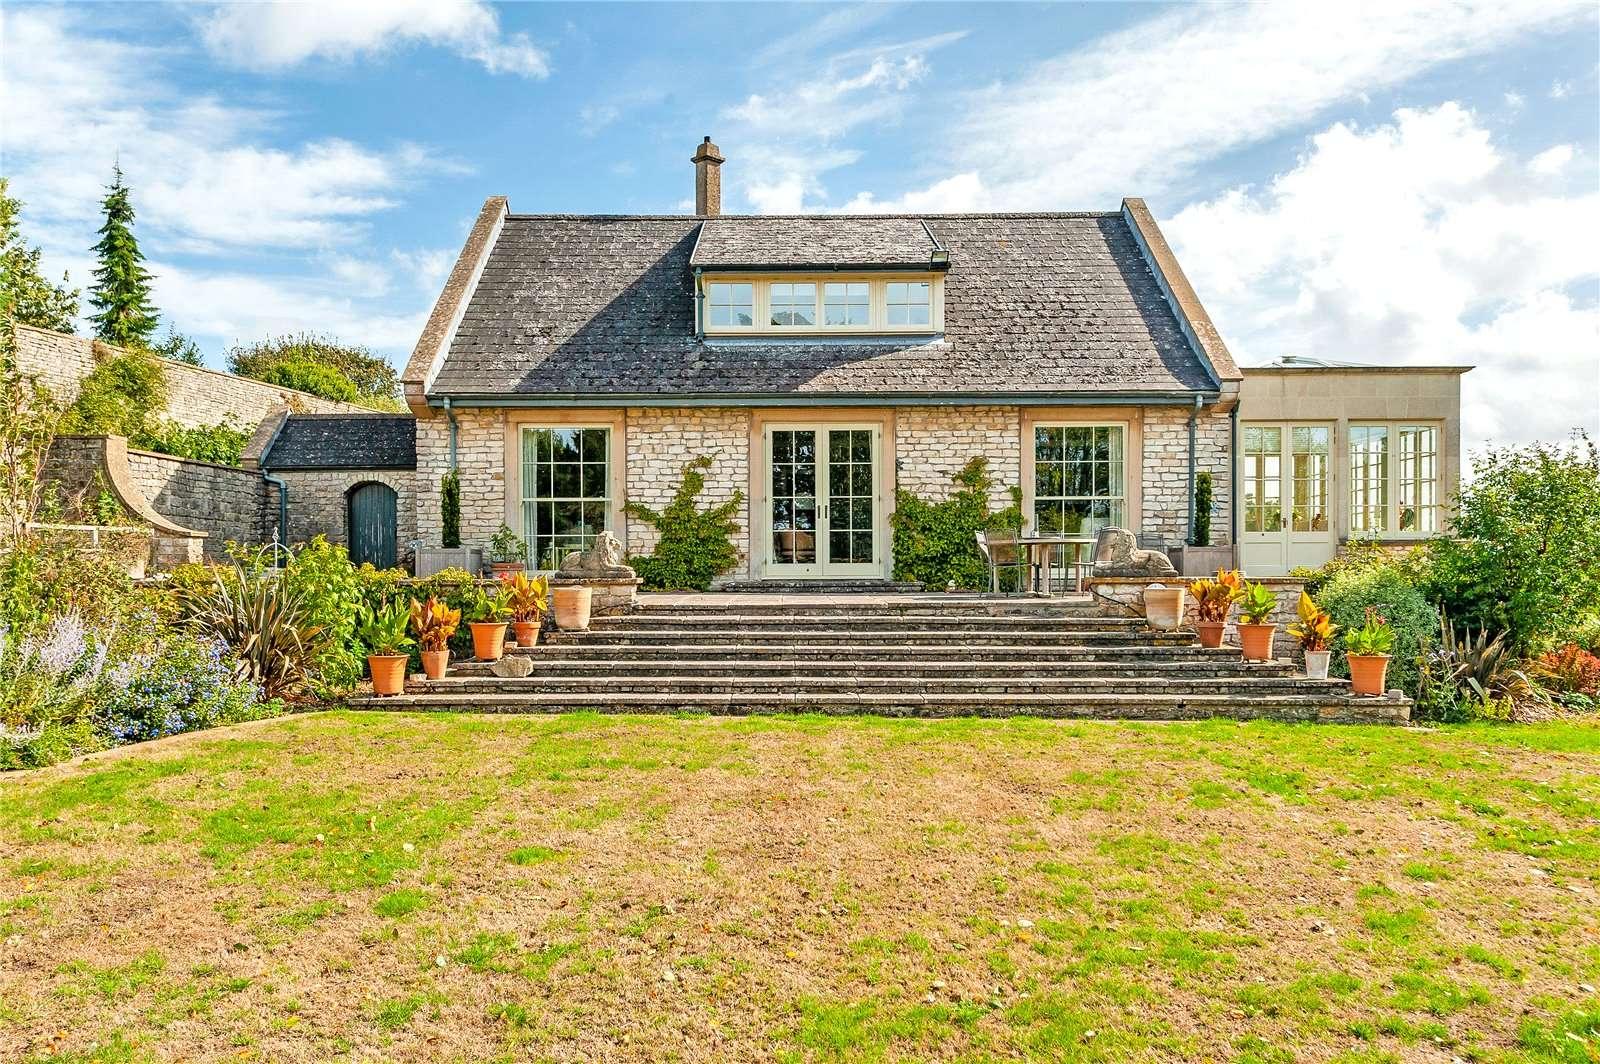 Savills   Loves Hill, Timsbury, Bath, Somerset, BA2 0EU   Properties for sale